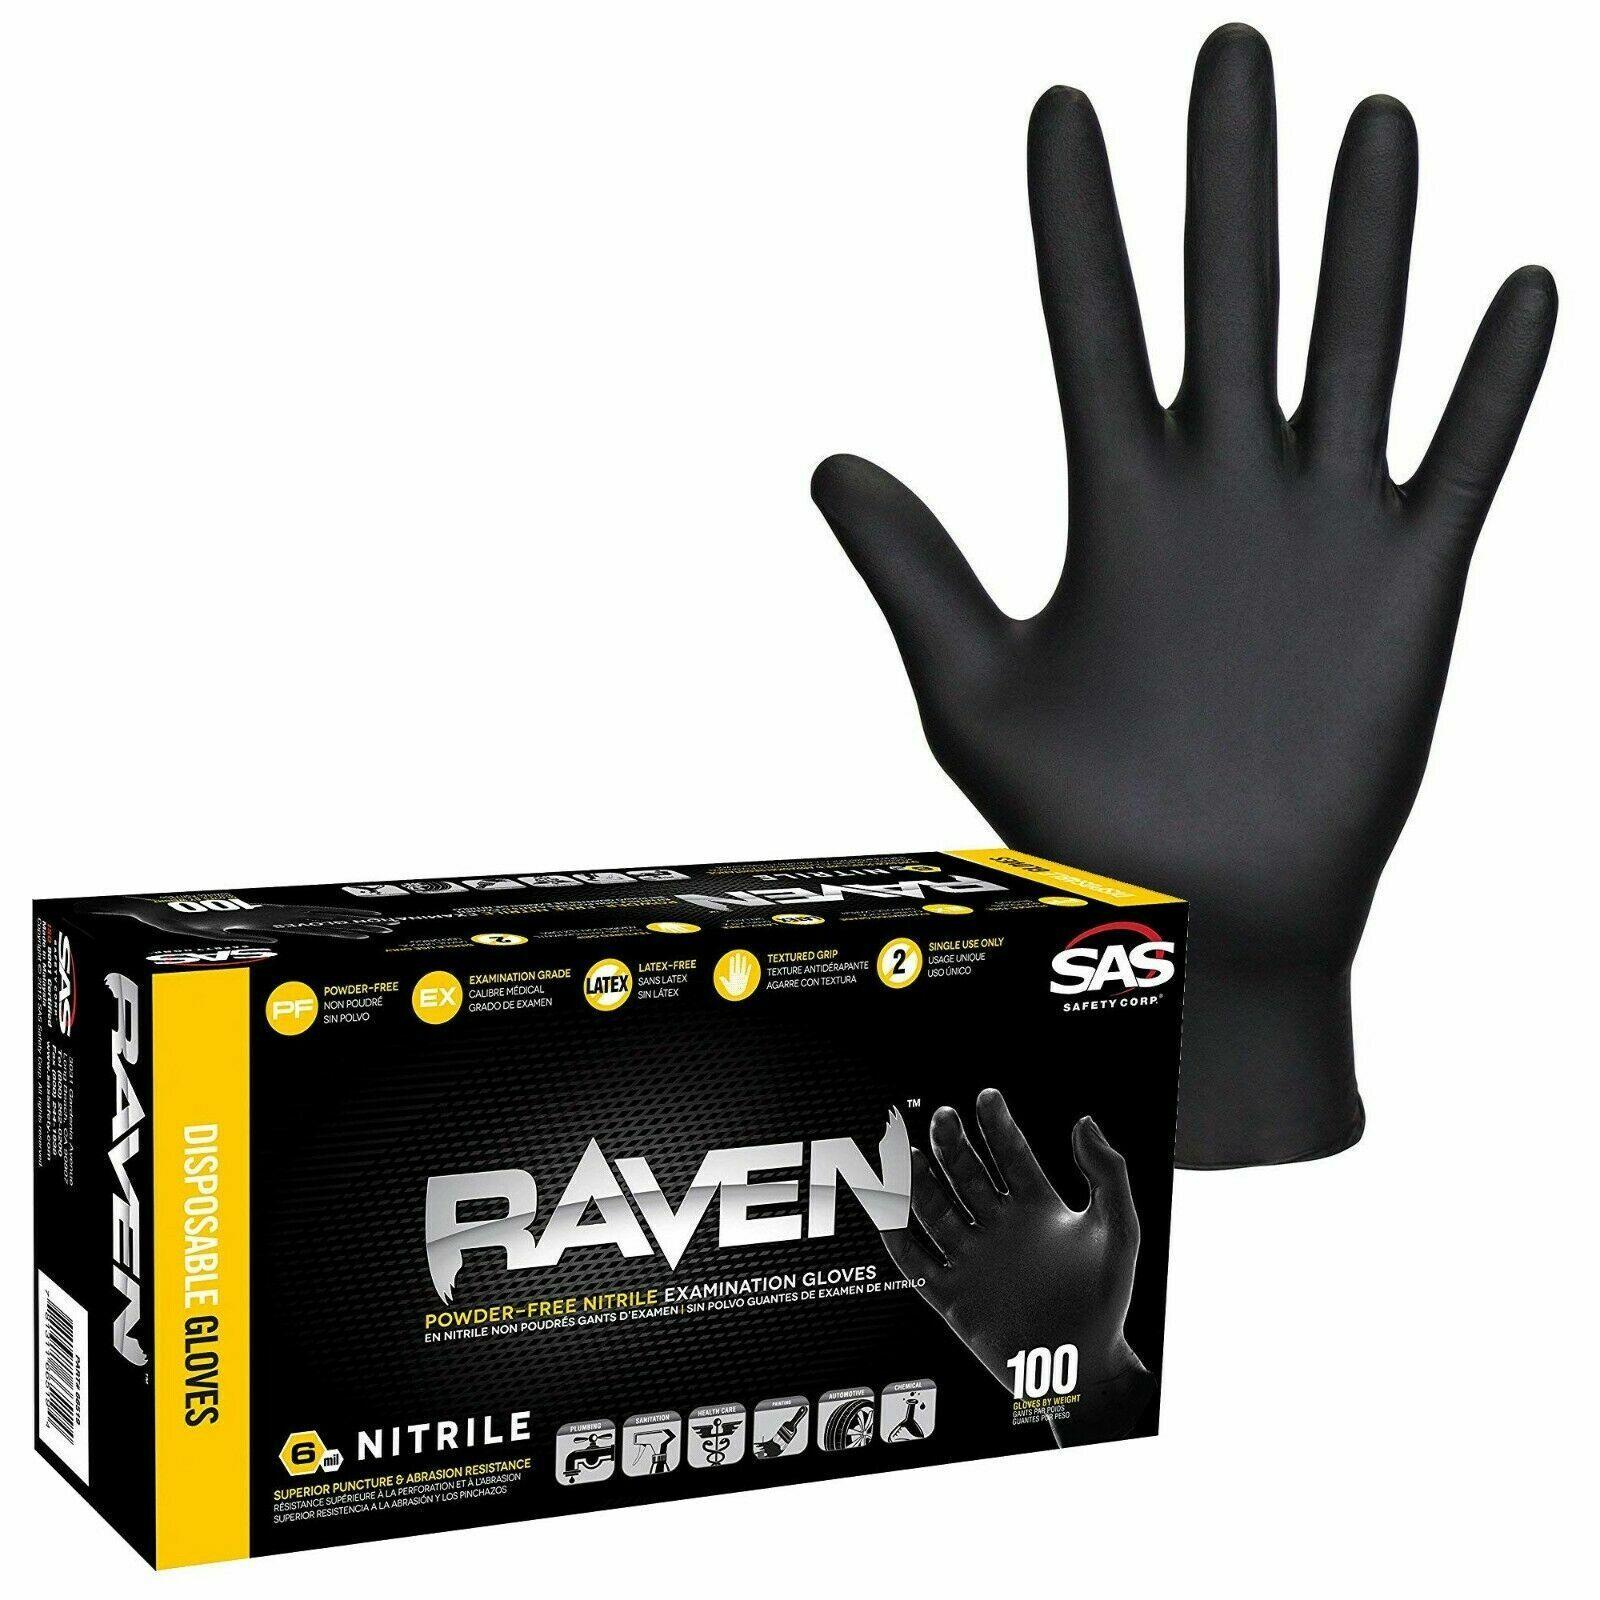 SAS Raven Black Nitrile Gloves Powder Free shipping